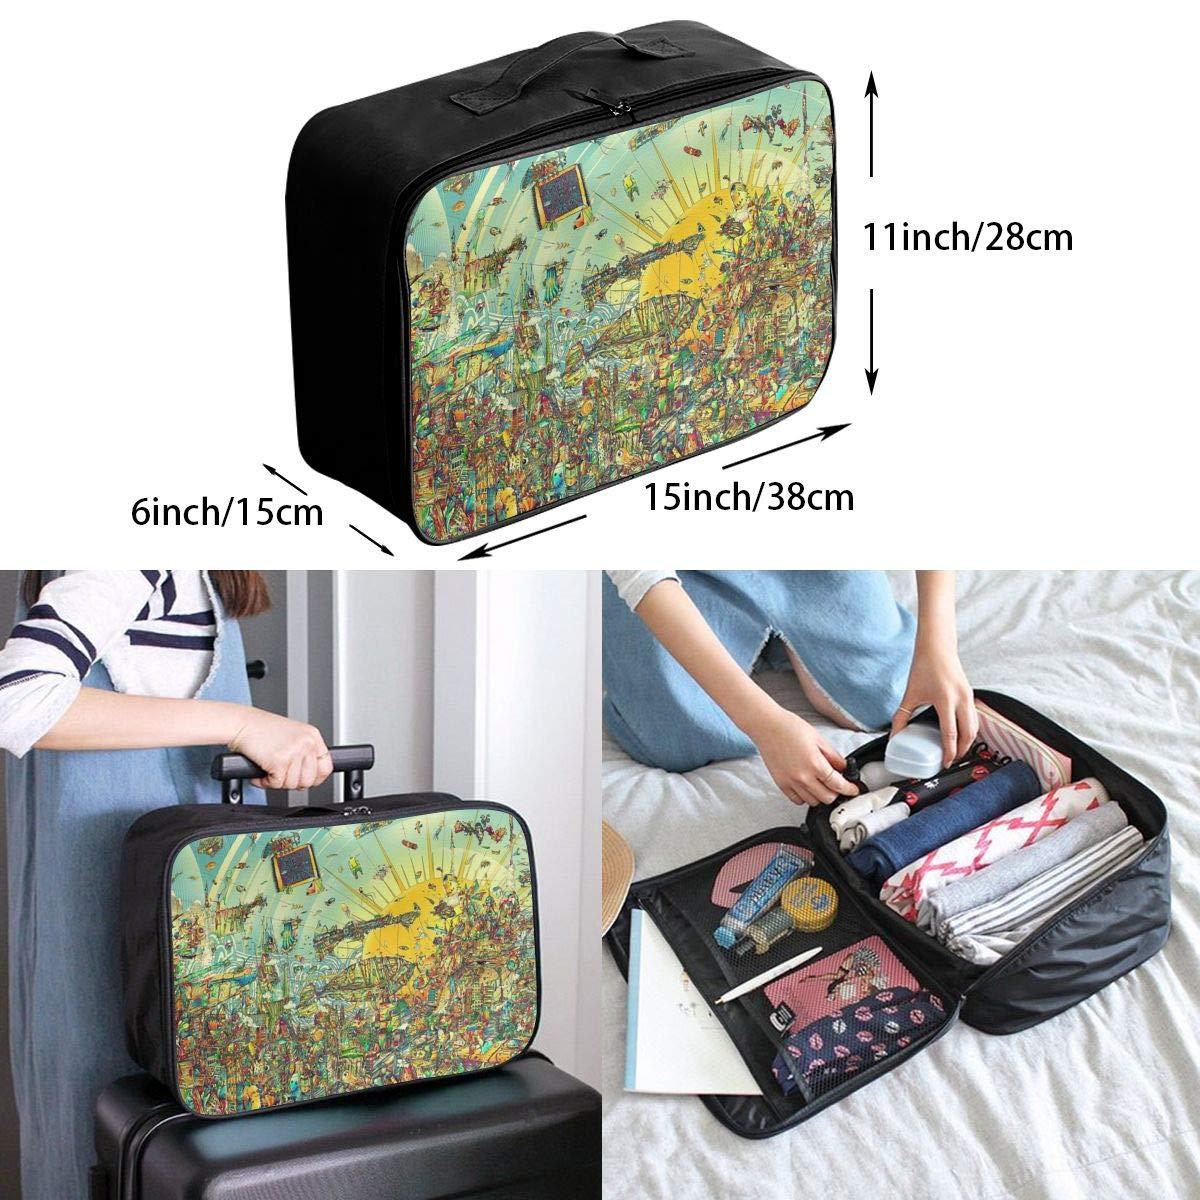 Travel Luggage Duffle Bag Lightweight Portable Handbag Abstract Print Large Capacity Waterproof Foldable Storage Tote